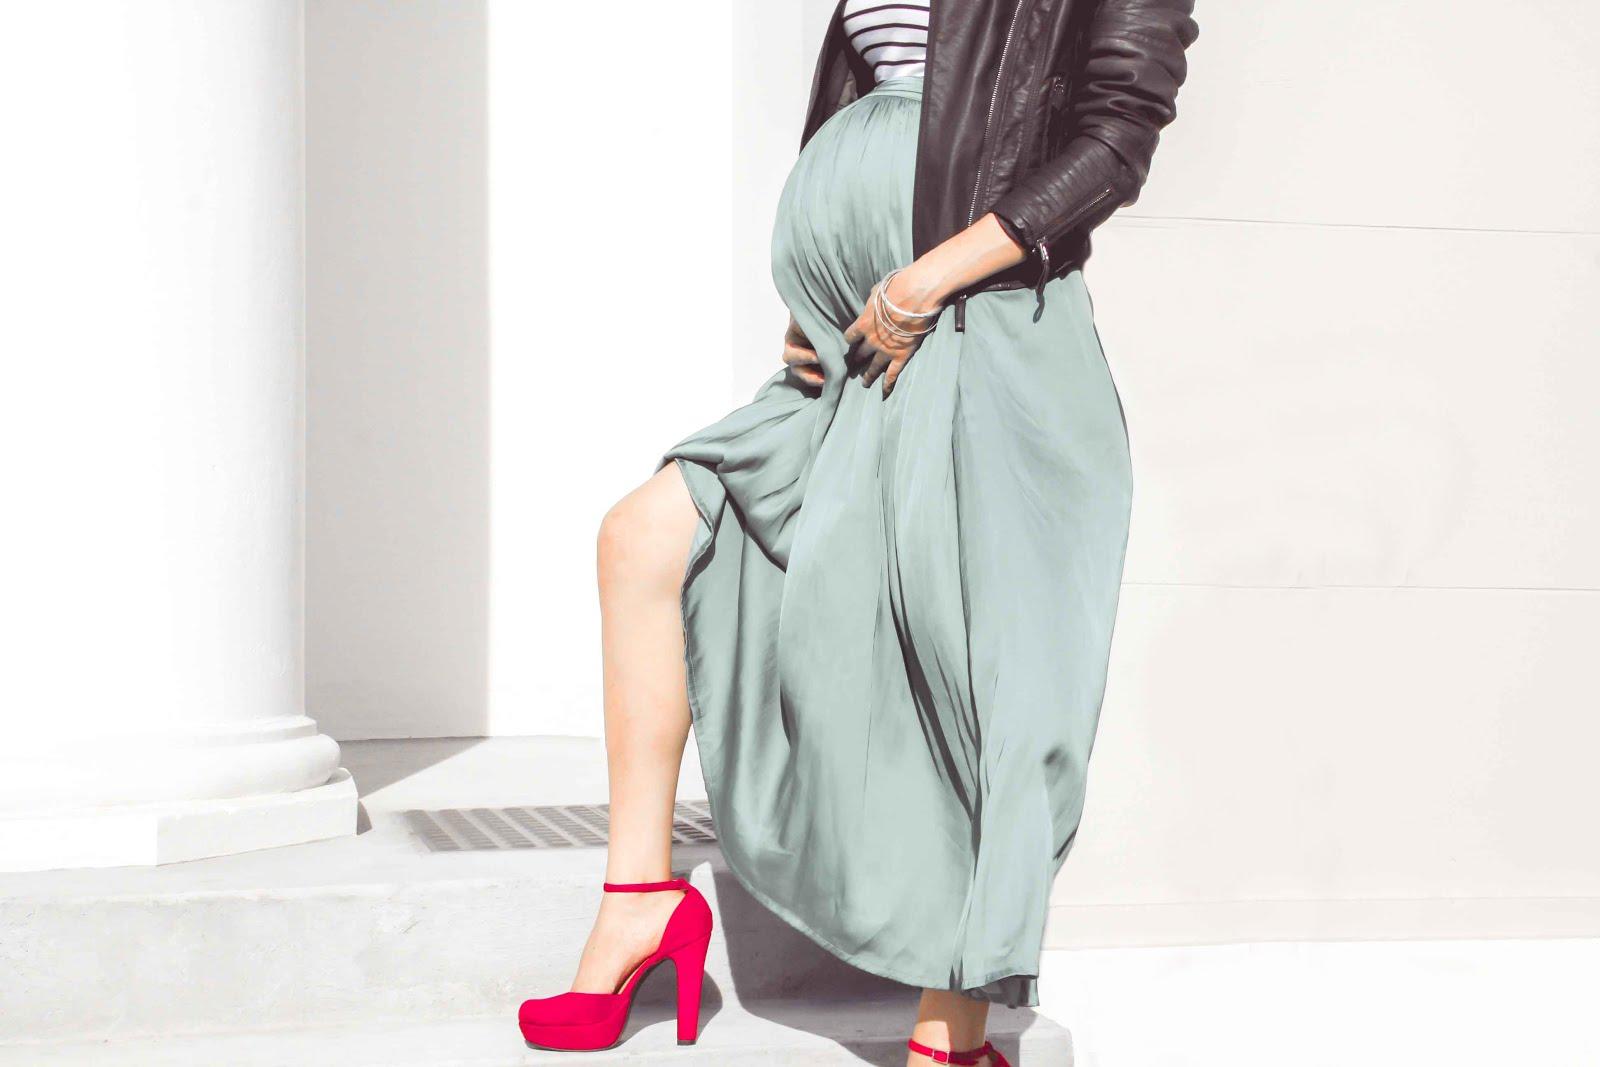 7d8c4c0a9 5 Tips para escoger el Vestido Ideal para una Embarazada - Beverly